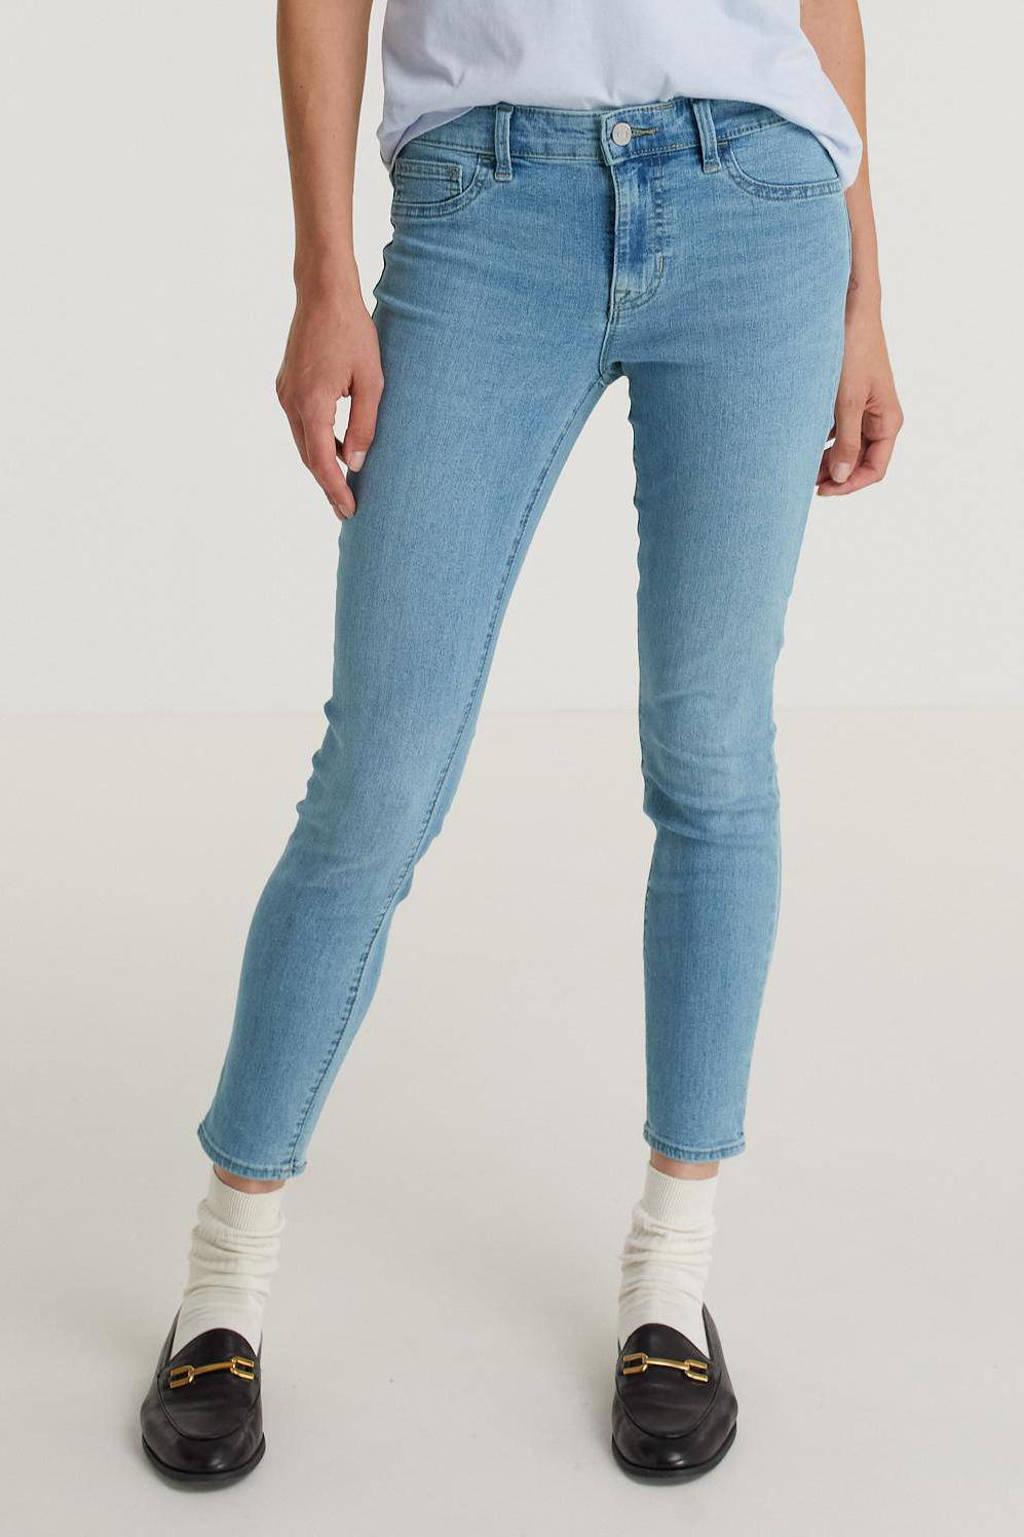 GAP skinny jeans COURTNEY light indigo, Light Indigo